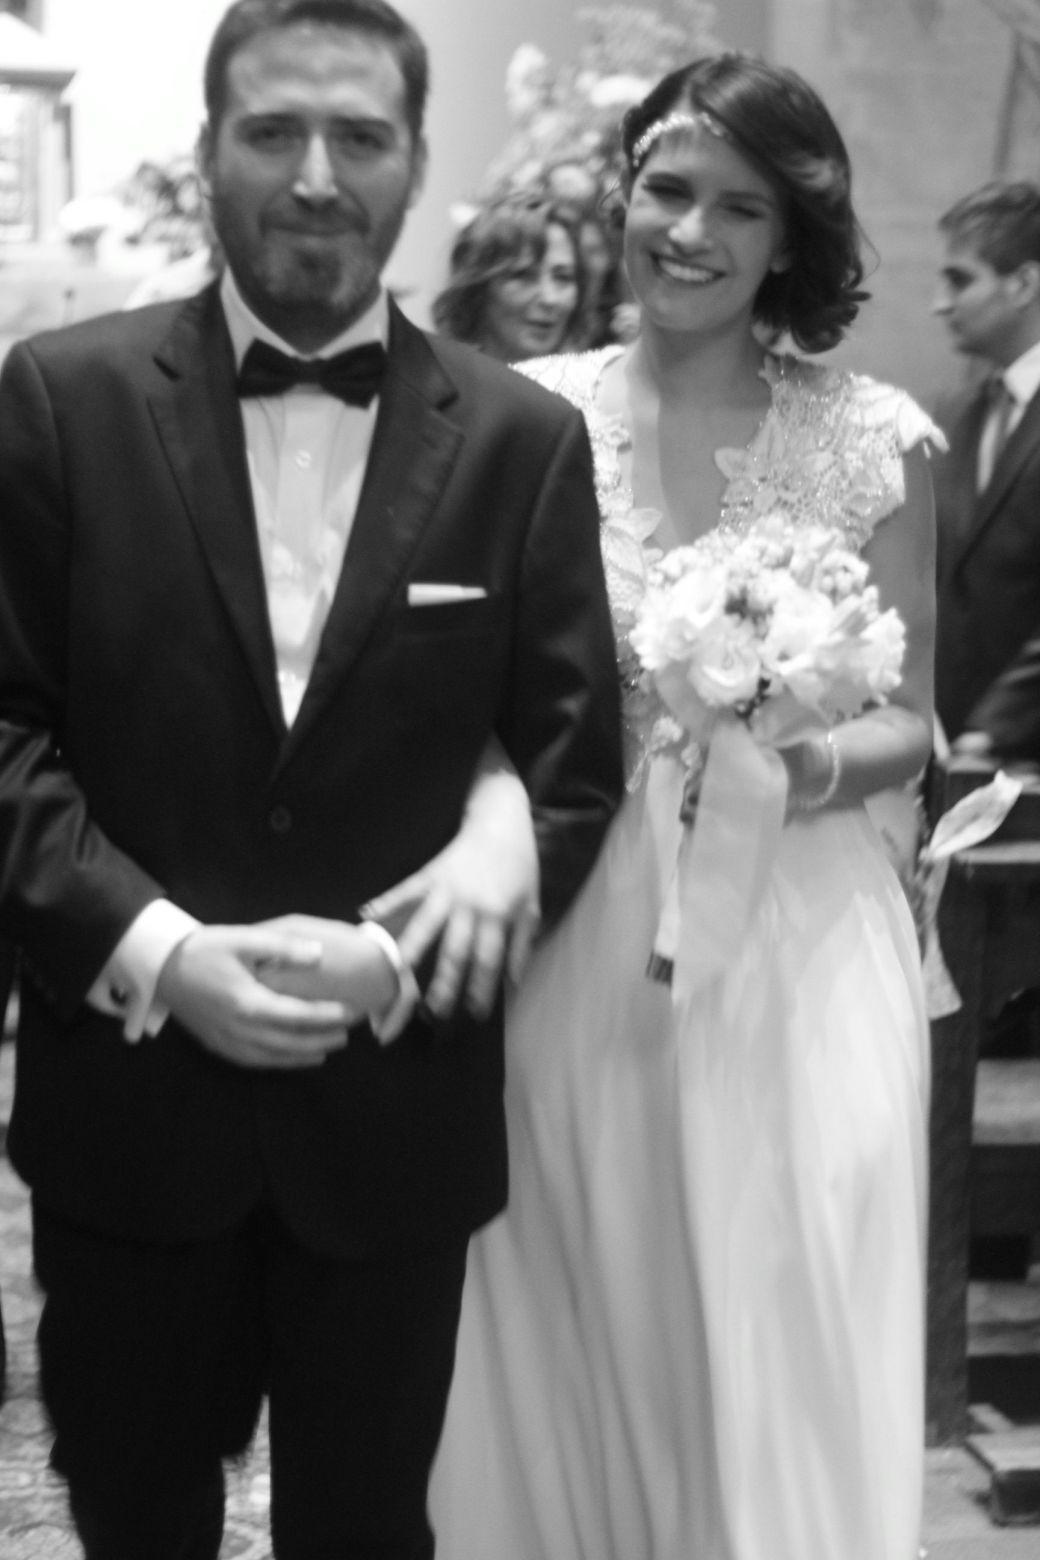 chile santiago san cristobal hill wedding 15